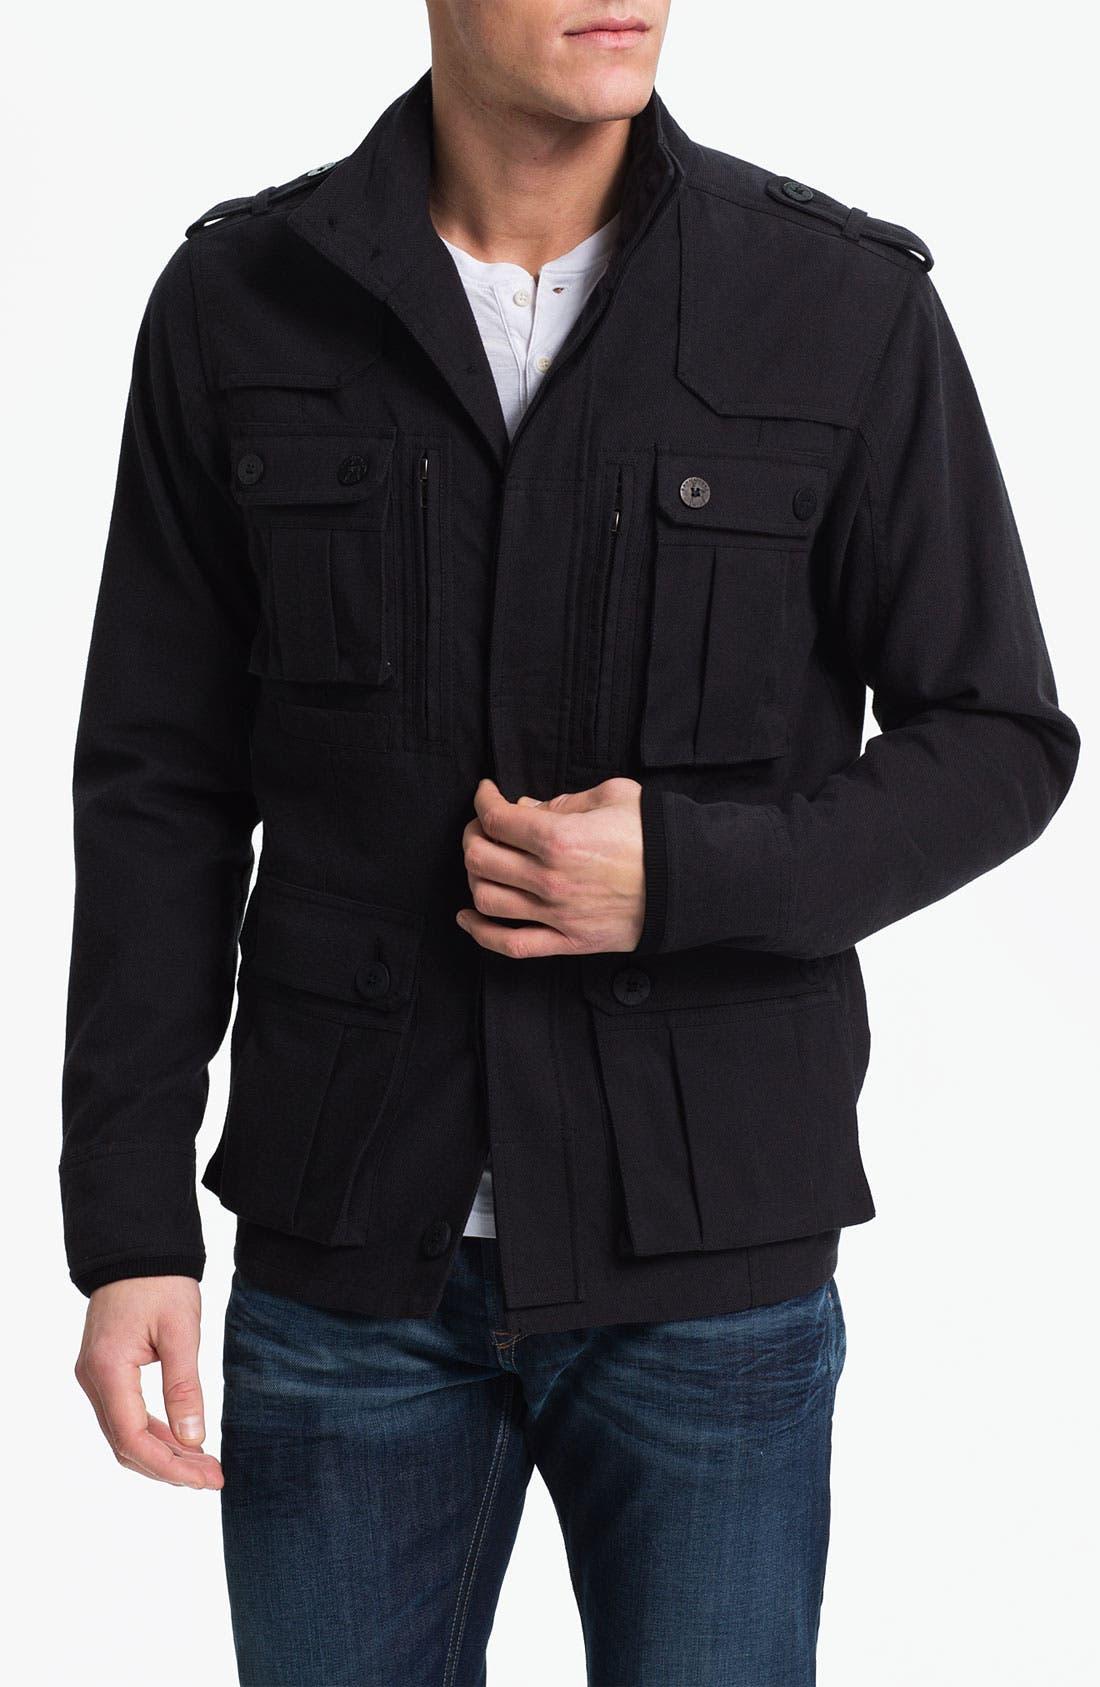 Main Image - Kane & Unke Cotton Twill Field Jacket